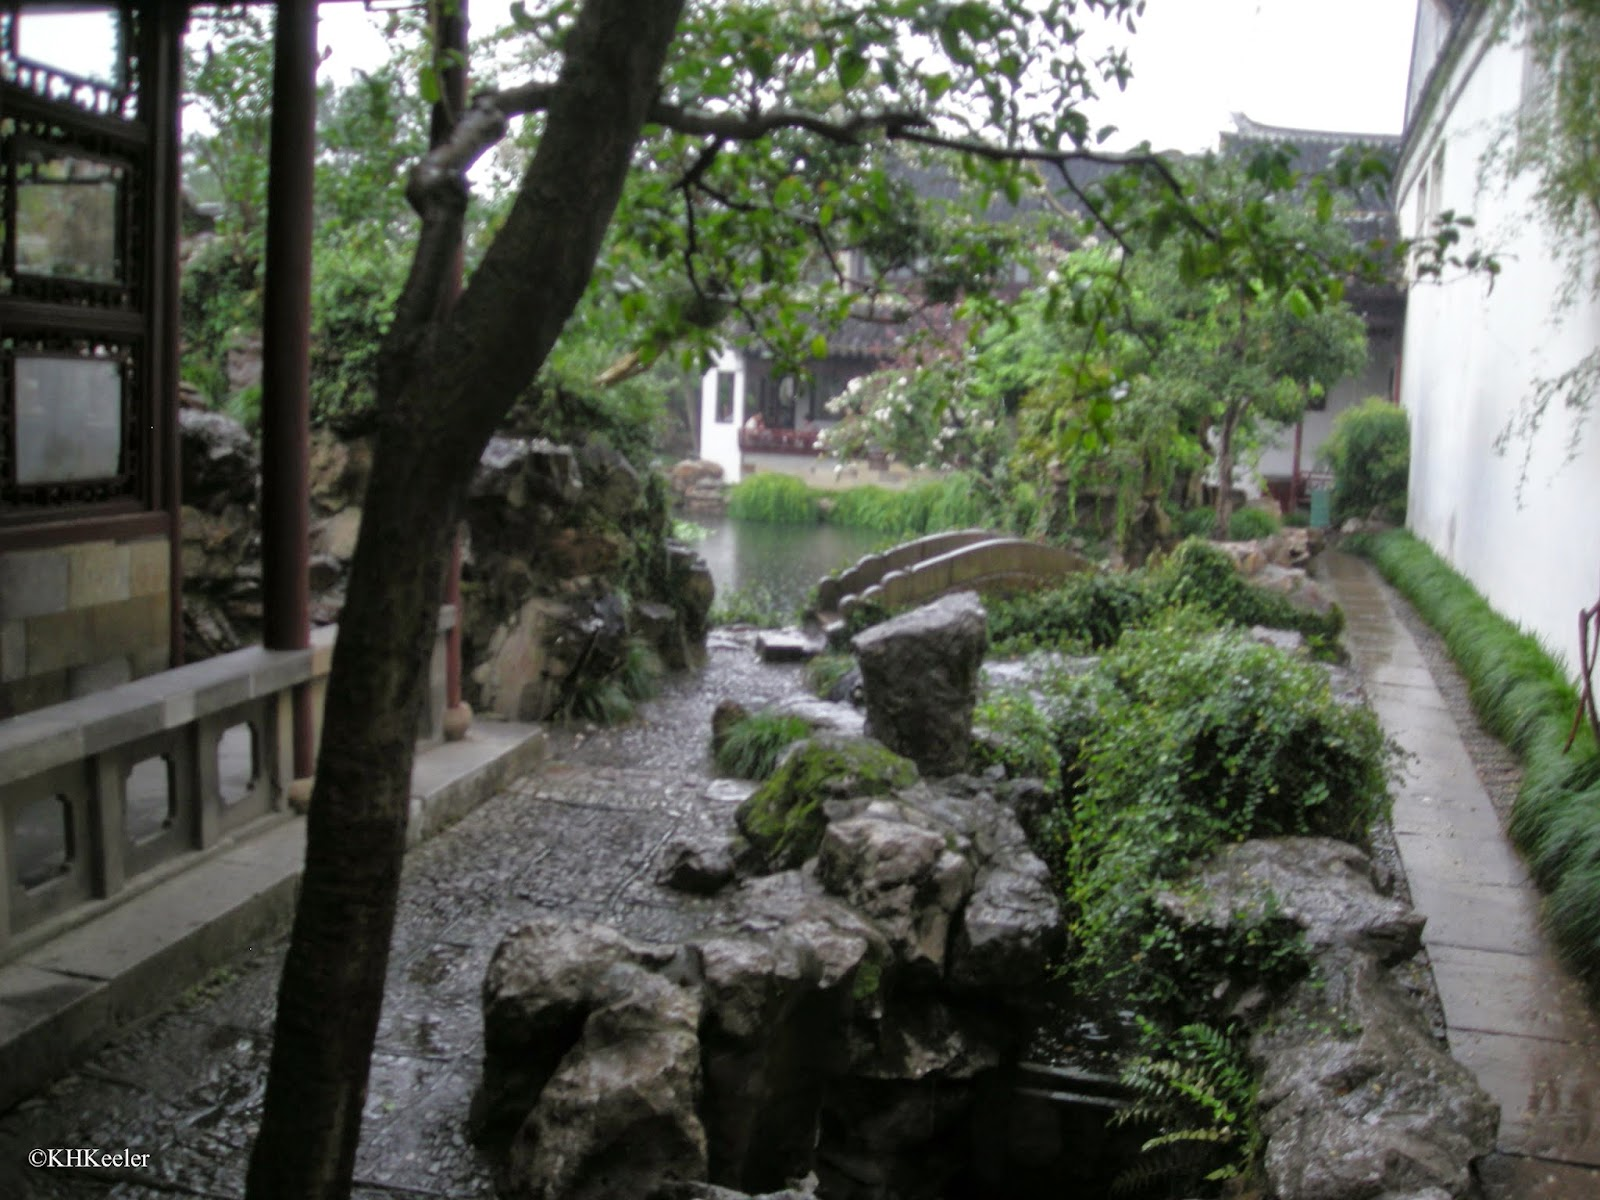 Garden of the Master of Nets, Suzhou, China